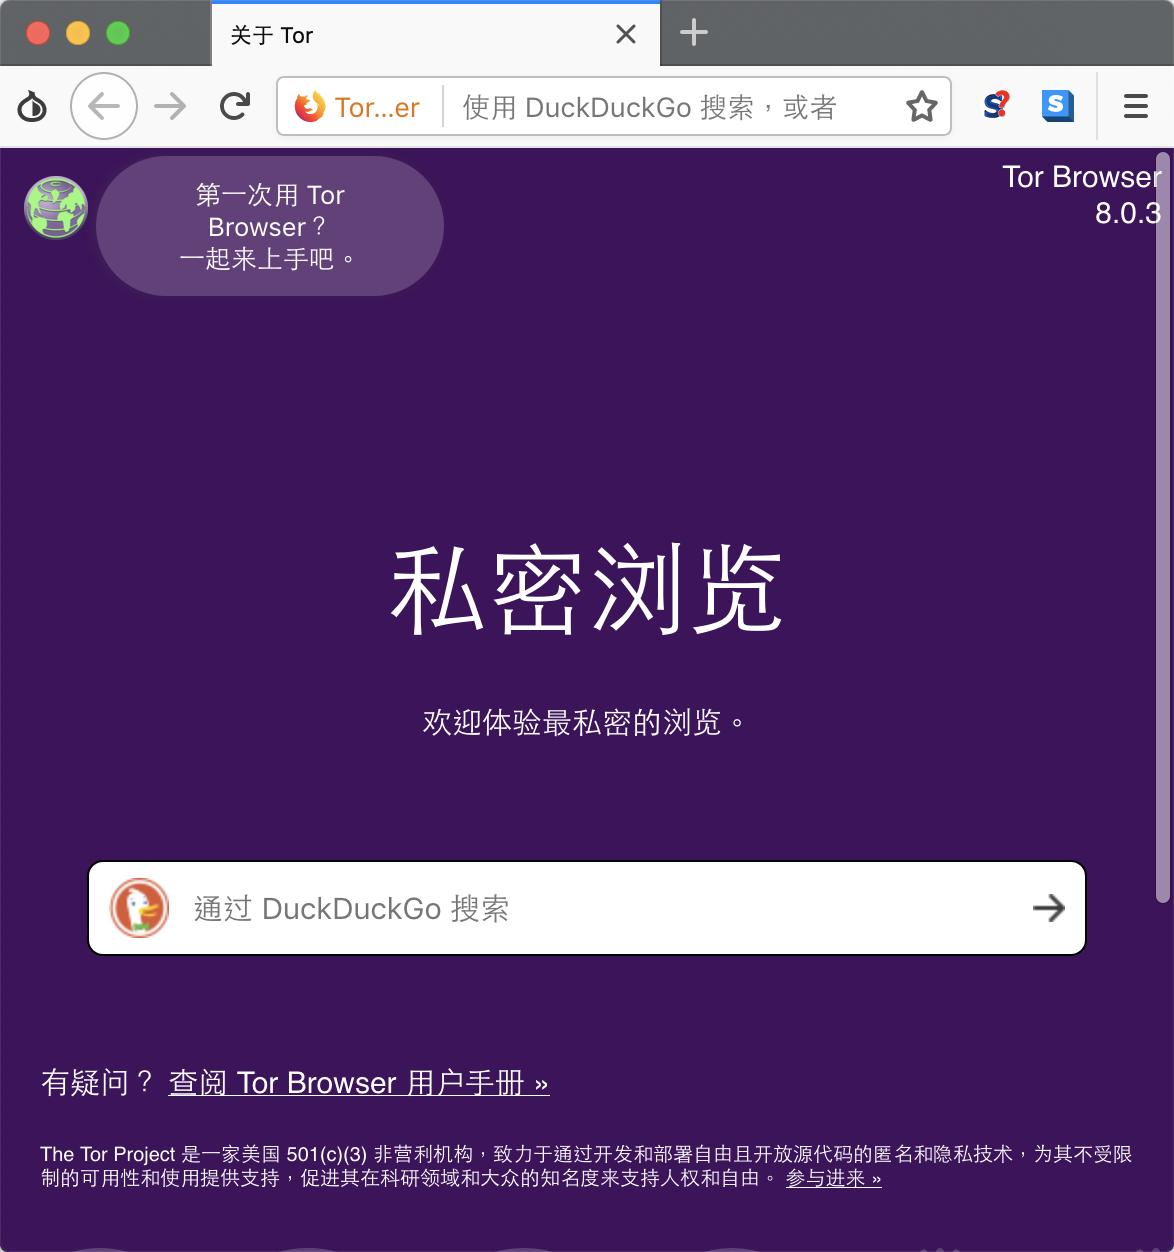 [2018-12-09]Mac 卸�d�件�氐浊宄�干�舻霓k法!/Tor Browser/Tor�g�[器 for Mac 端口被修改后�o法�����}�理方案